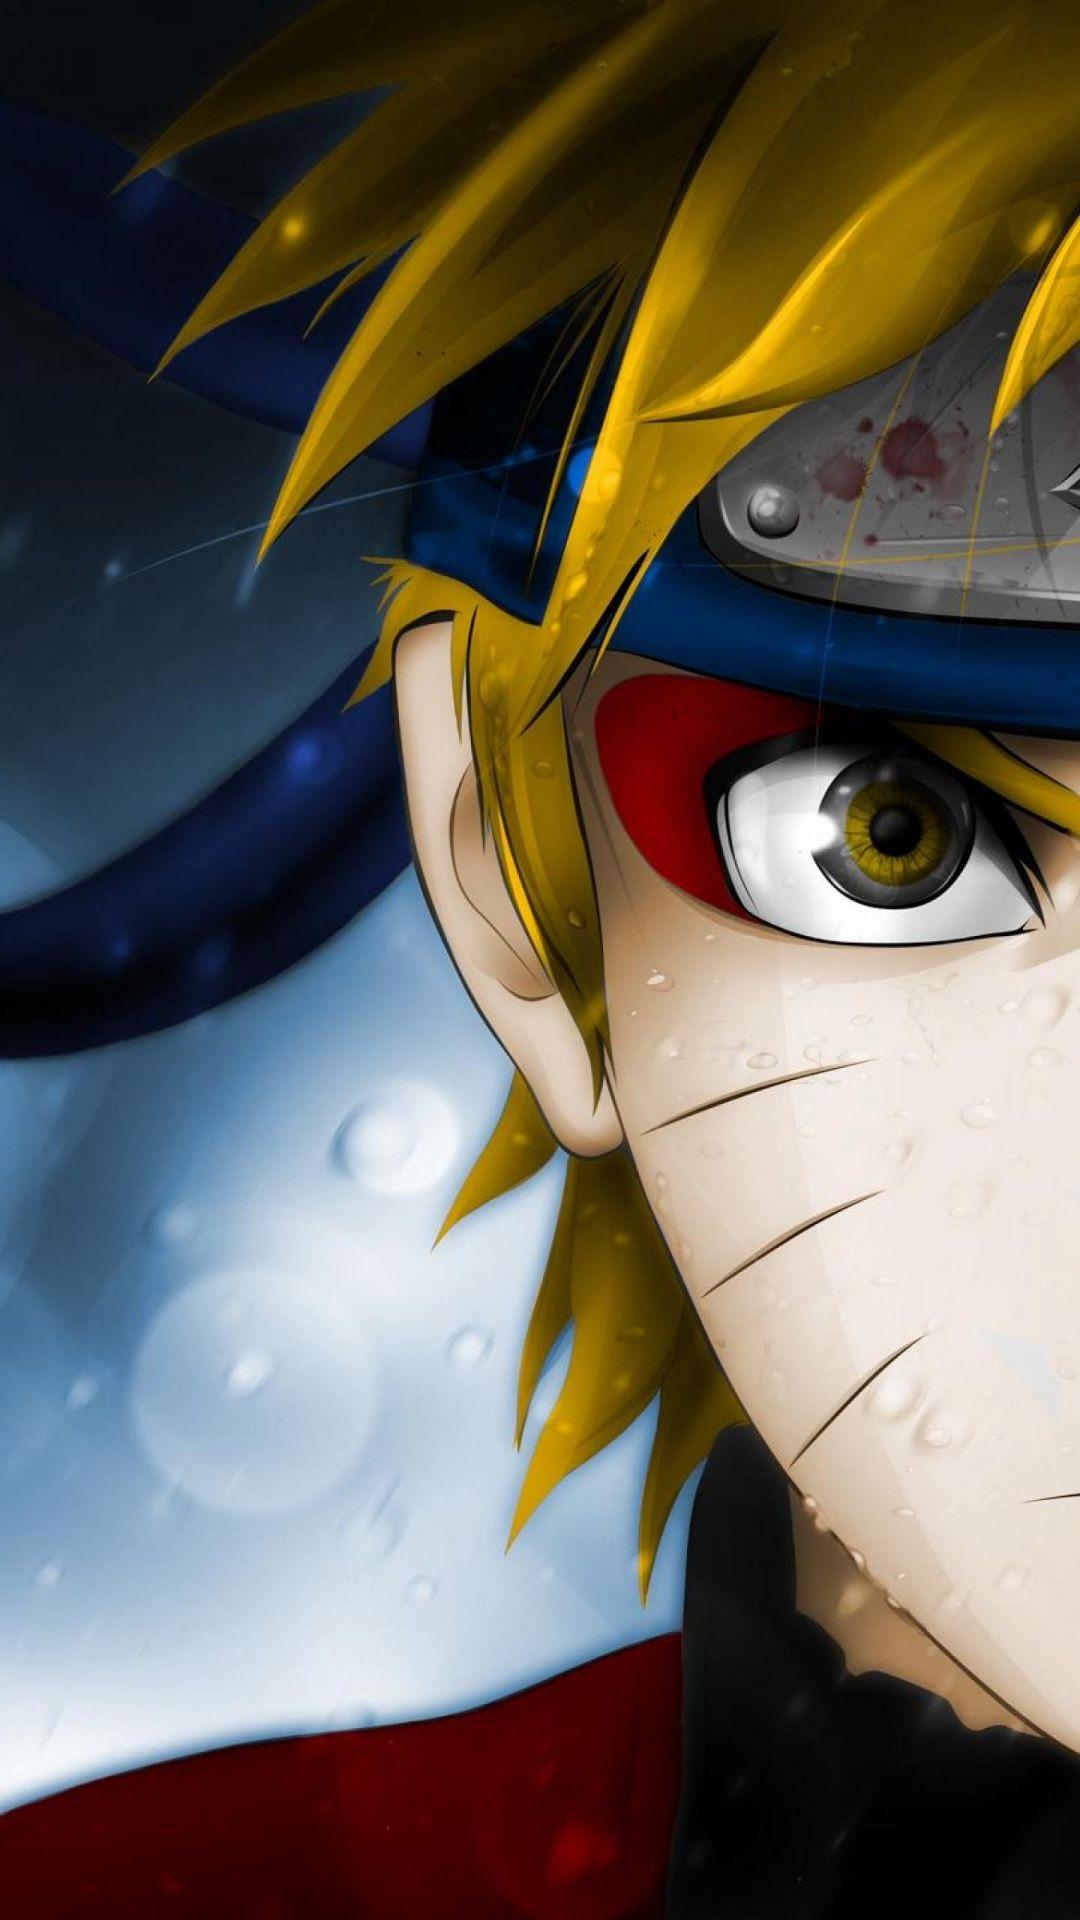 Free download Wallpaper 4K Iphone Naruto Wallpaper Iphone ...